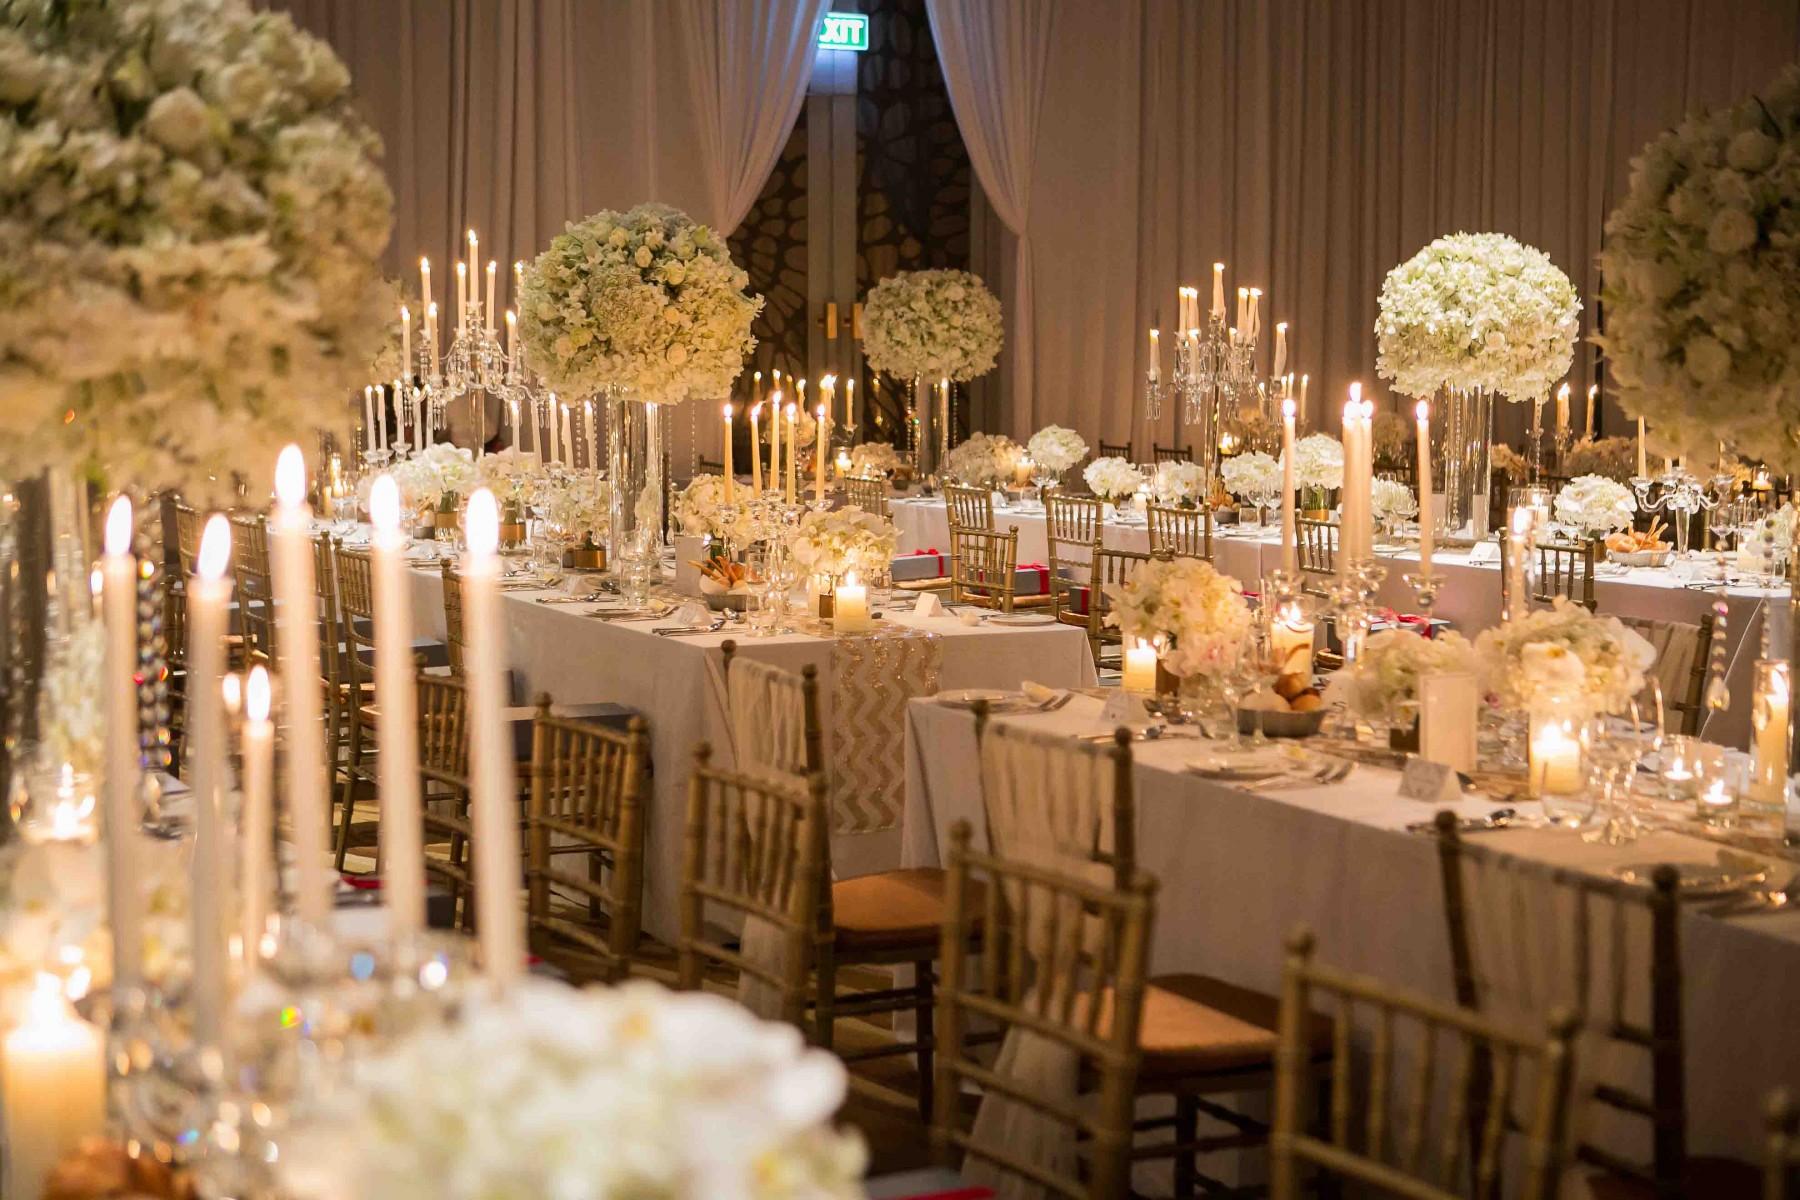 Pullman Phuket wedding